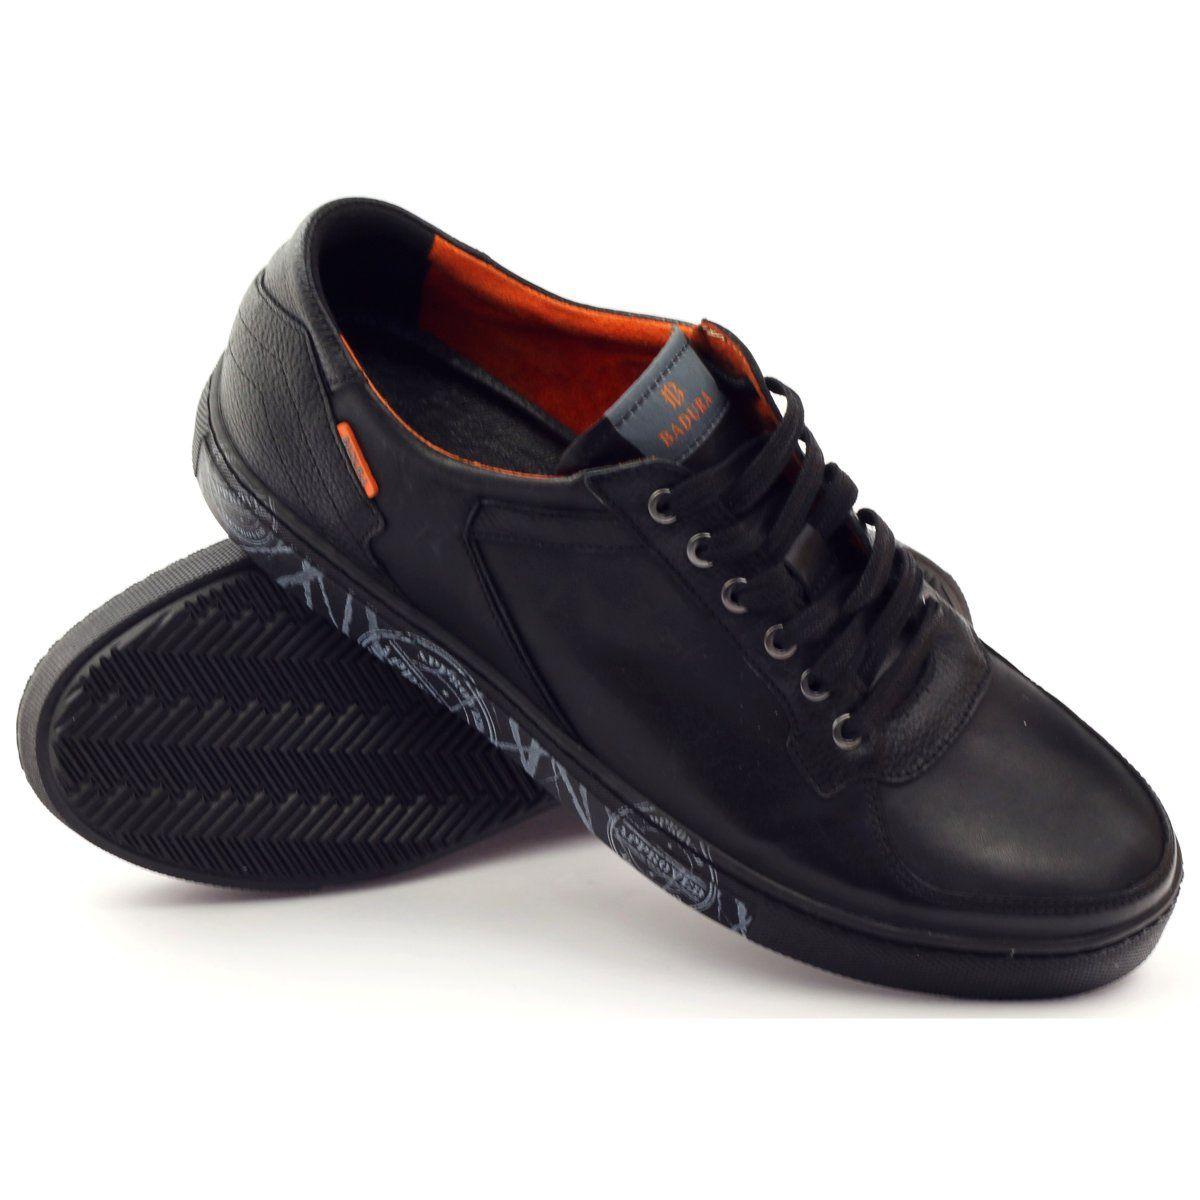 Polbuty Meskie Sportowe Badura 3361 Czarne Black Sports Shoes Sport Shoes Men Sports Shoes